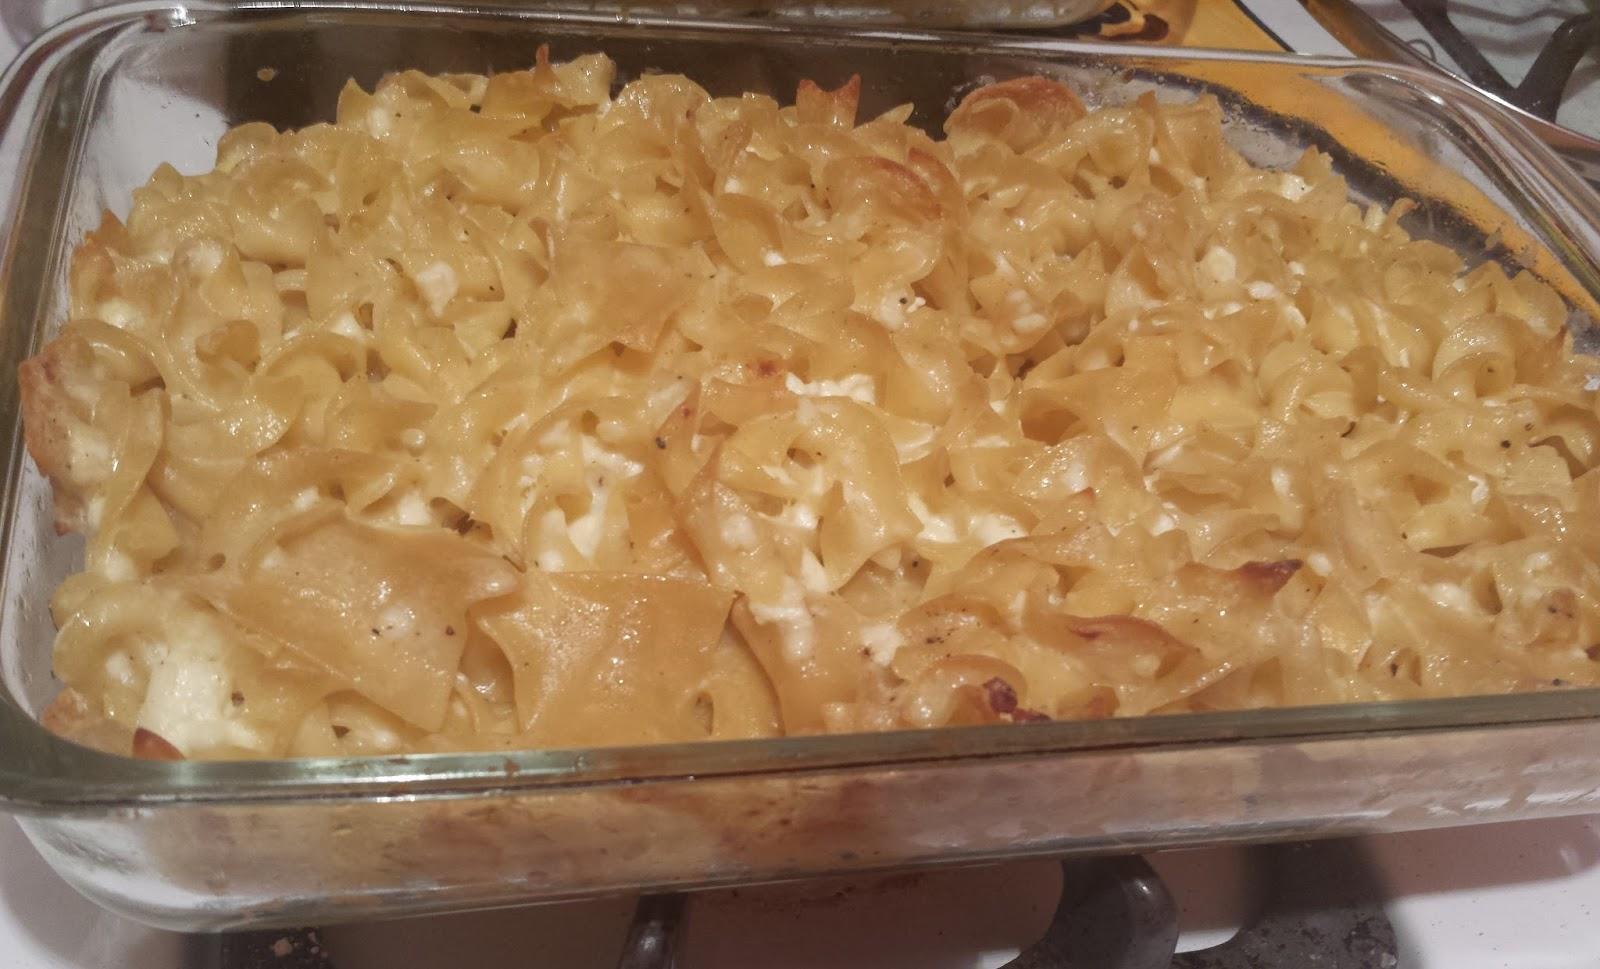 Galley Kitchen Gourmet: Savory Lokshen (Noodle) Kugel